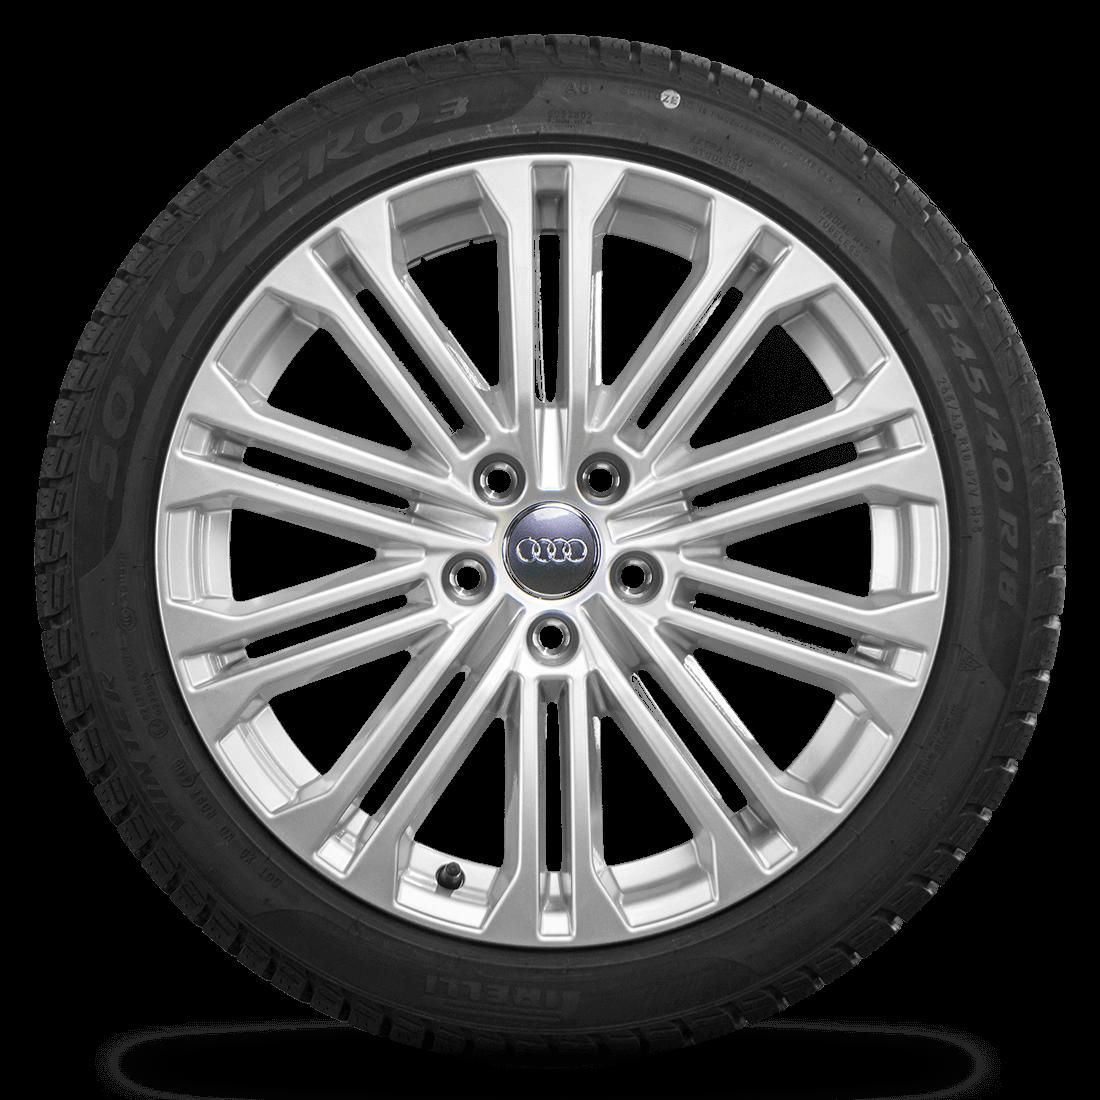 Audi 18 Zoll Felgen A5 S5 8W Alufelgen Winterreifen Pirelli Winterräder S line